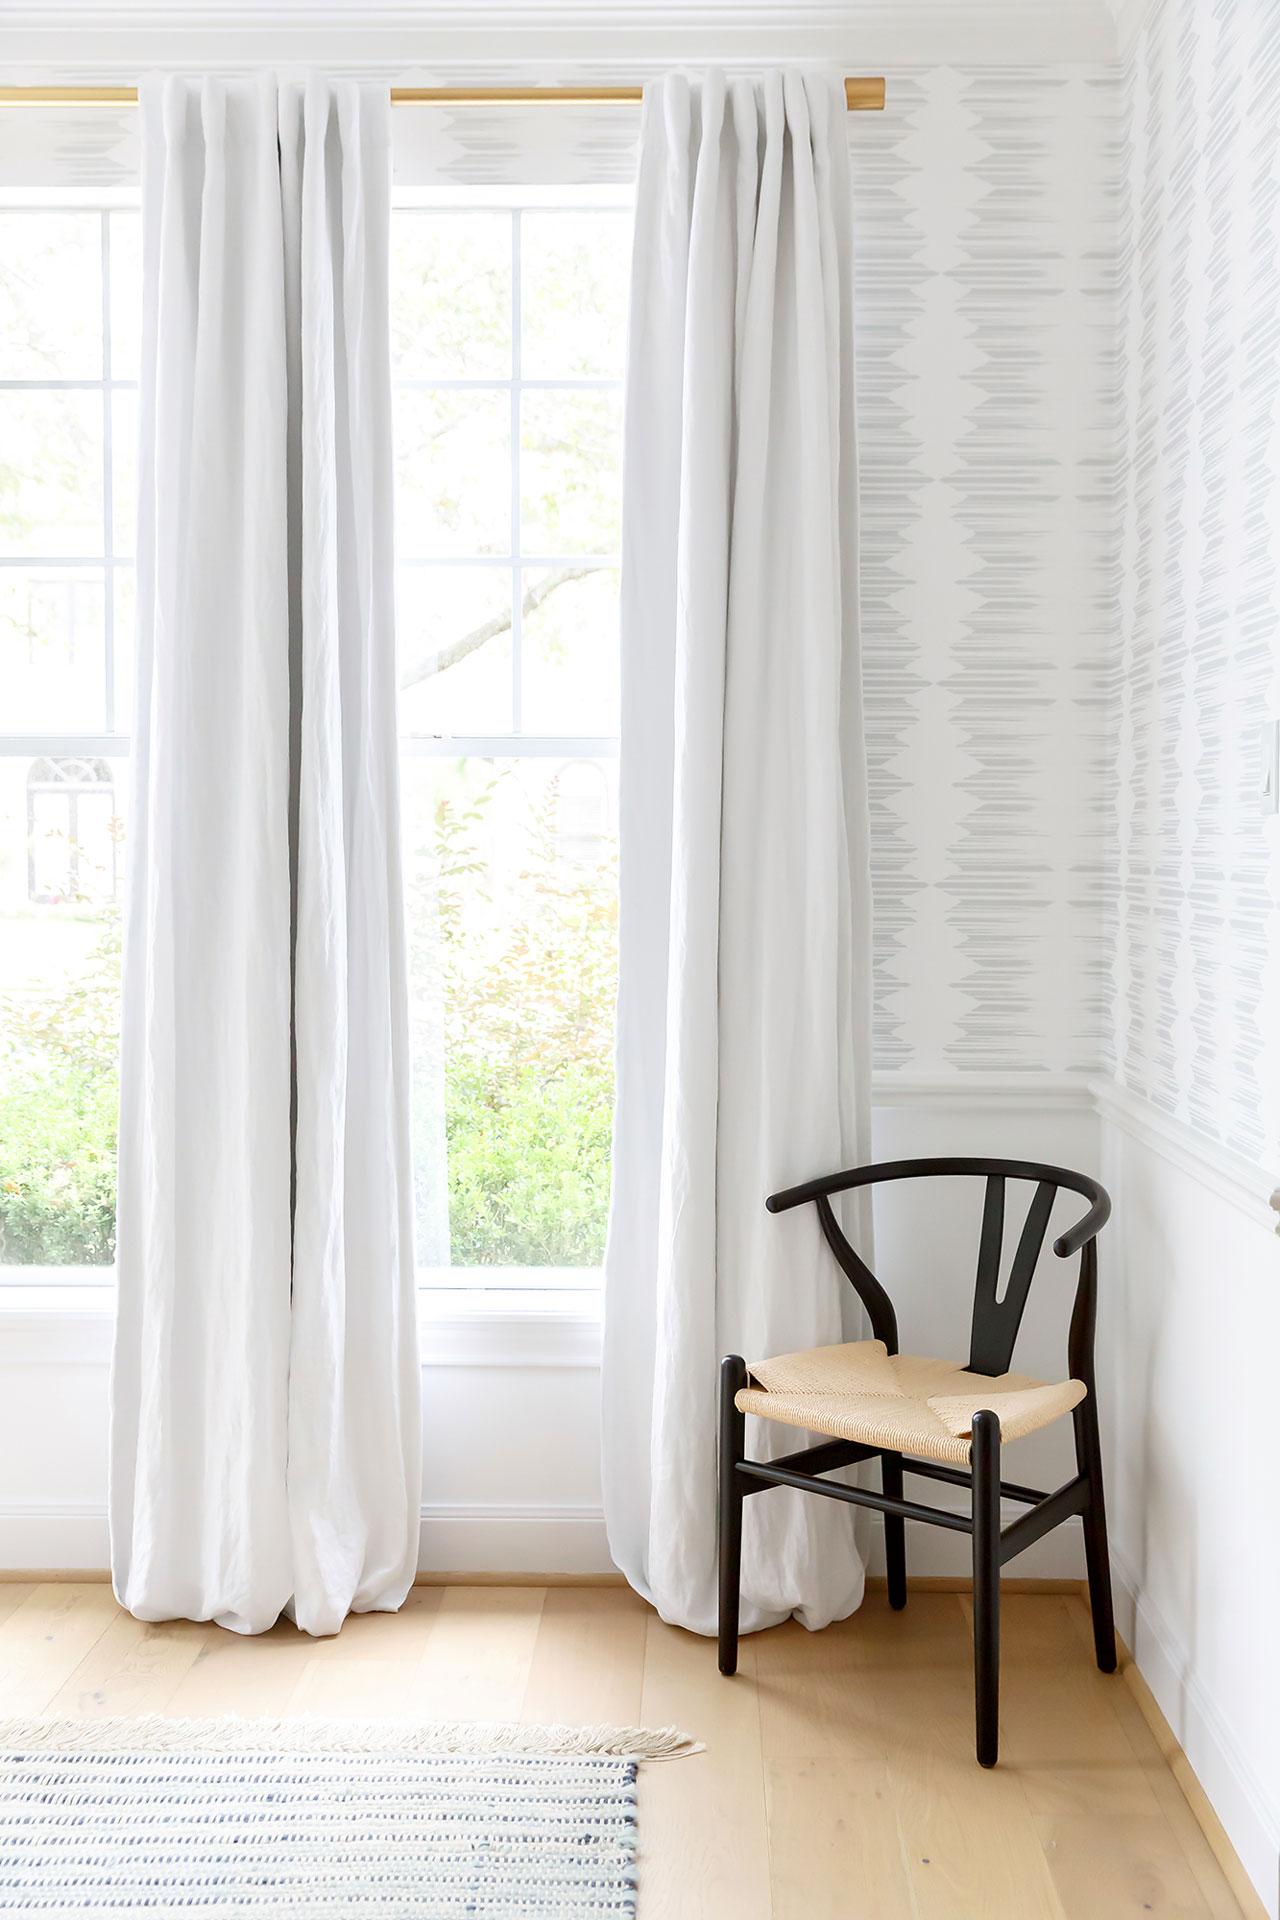 STONE TEXTILE TRIBAL FRINGE (CUSTOM COLOR) Designer: Stone Textile Studio